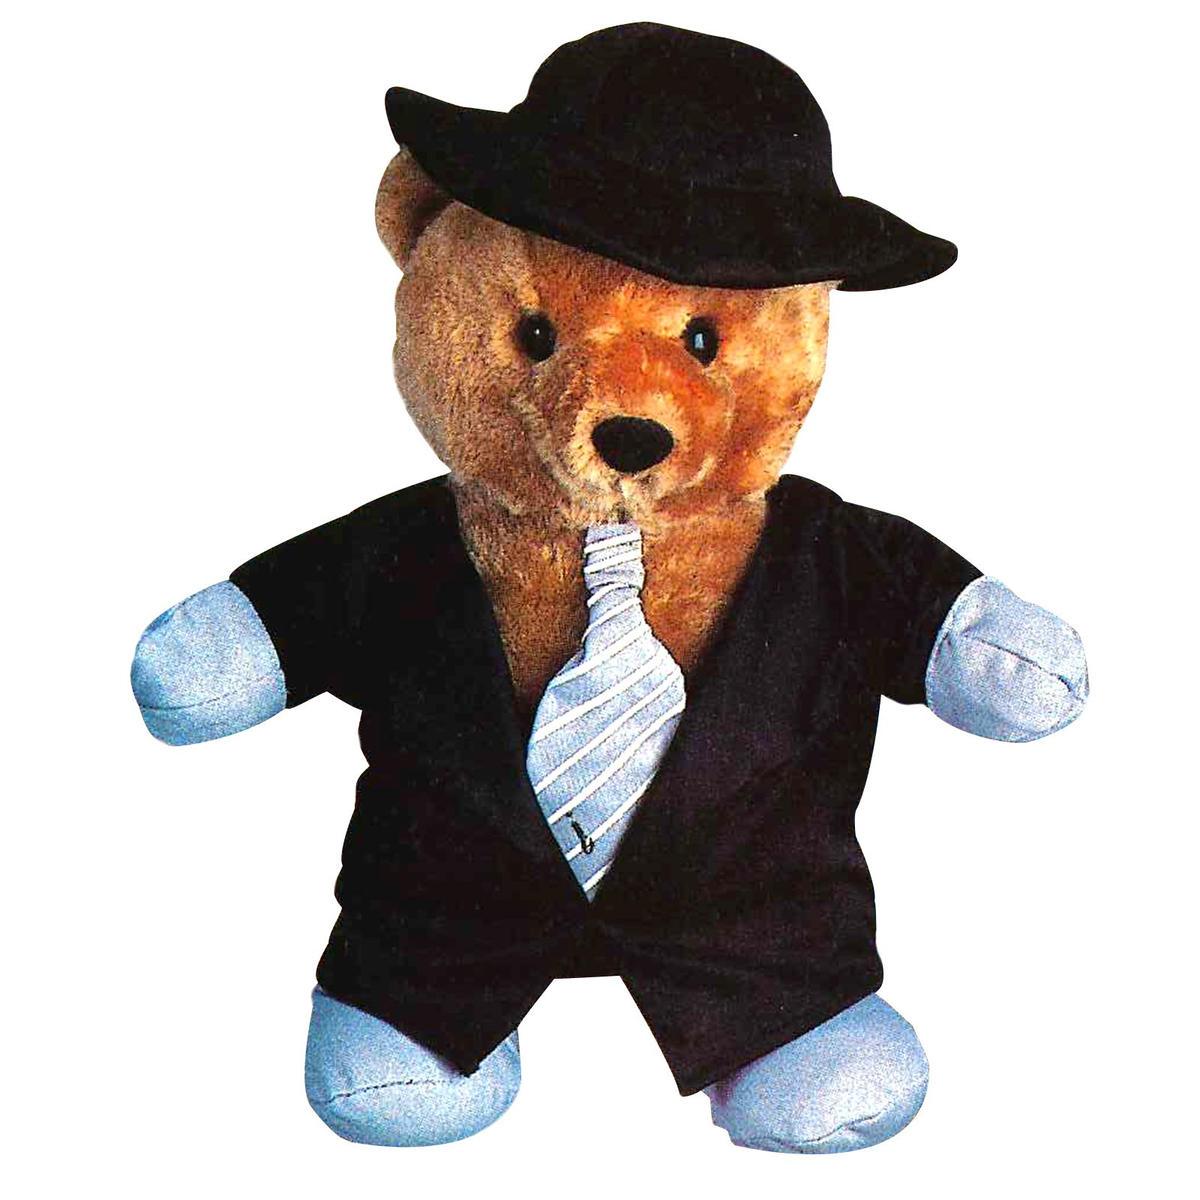 wwe superstar teddy bears photos wwe